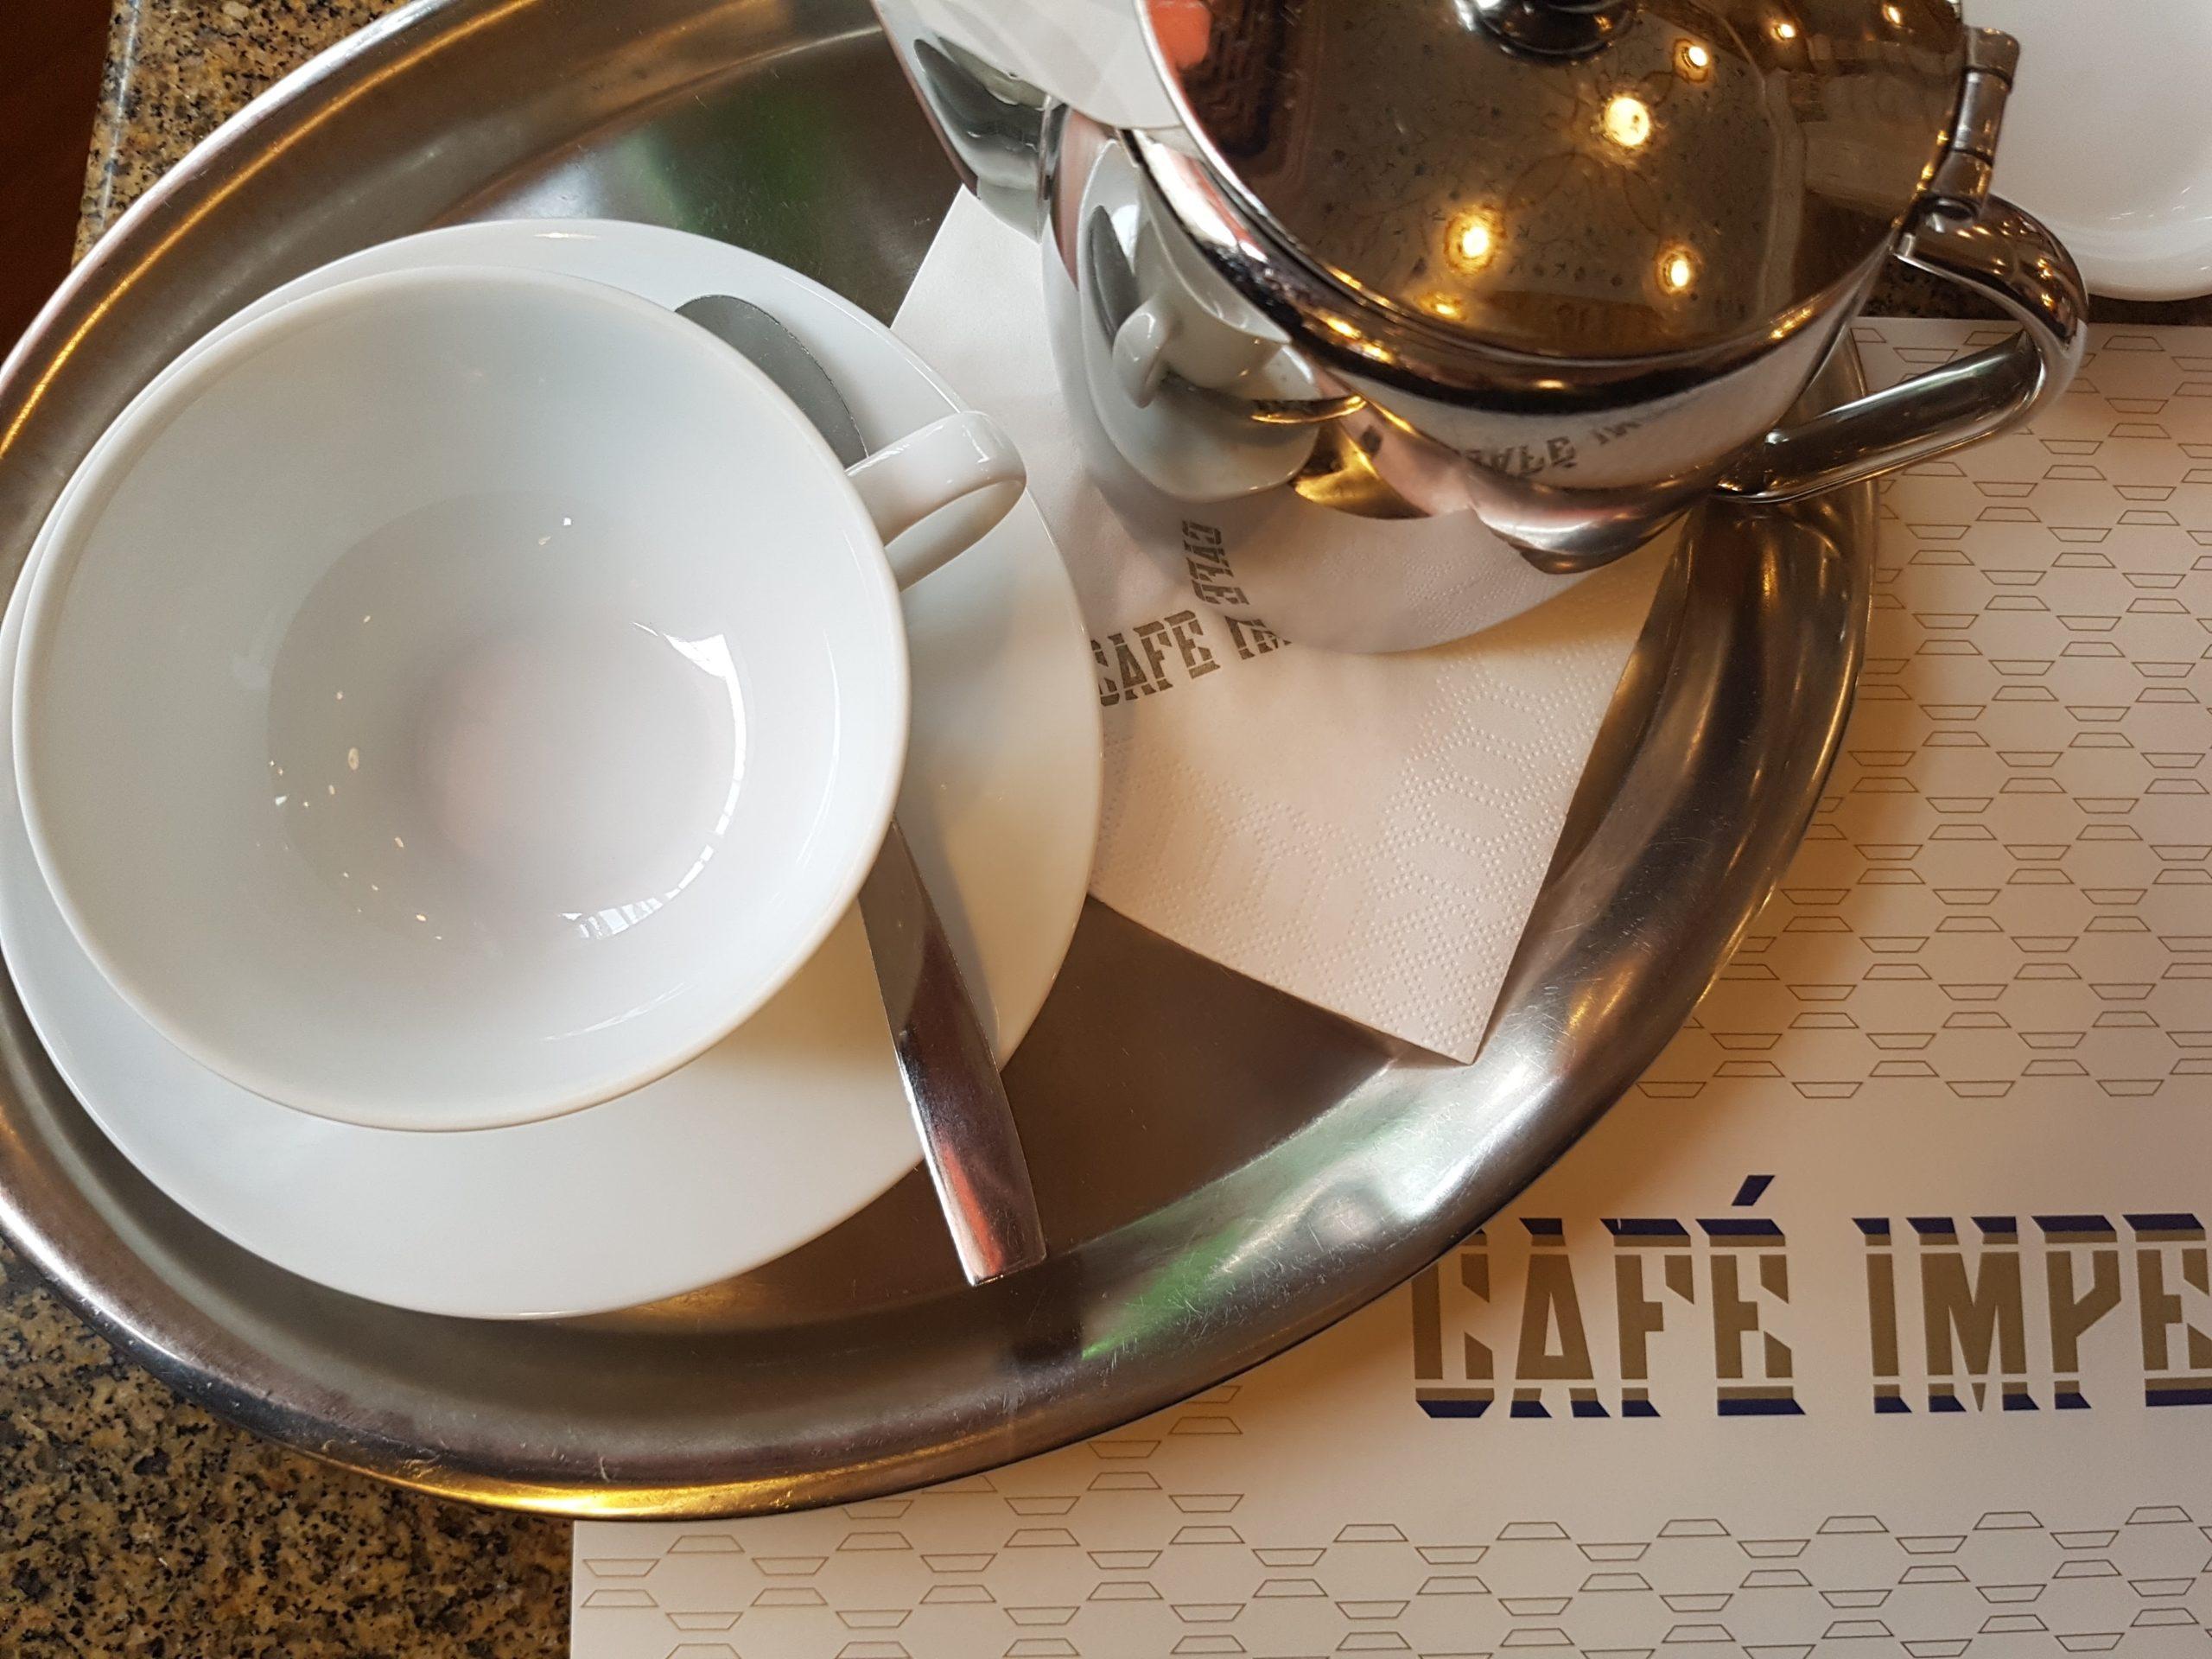 Cafe Imperial Prague, Czech